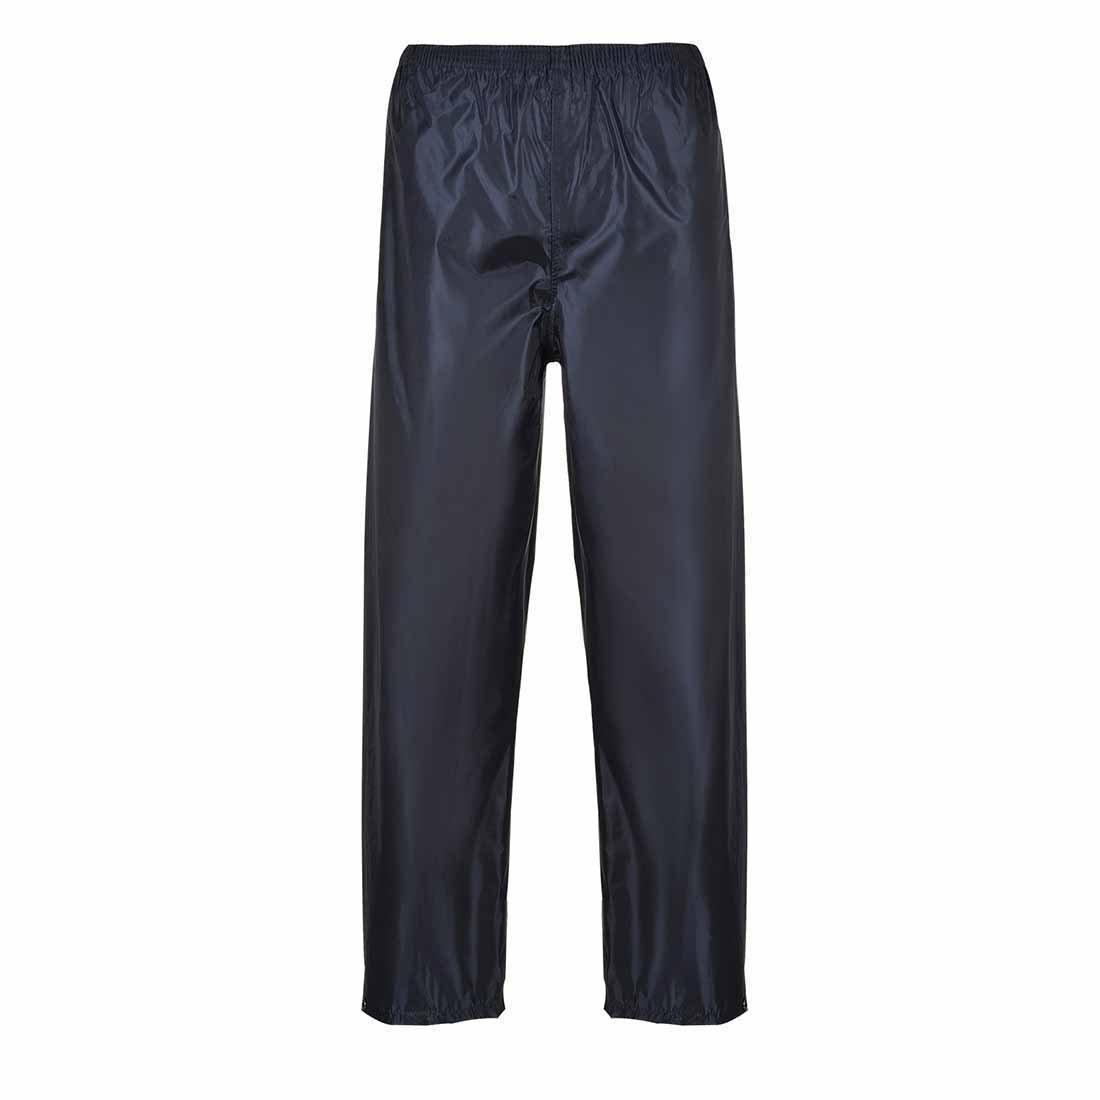 Portwest Classic rain trouser (S441)